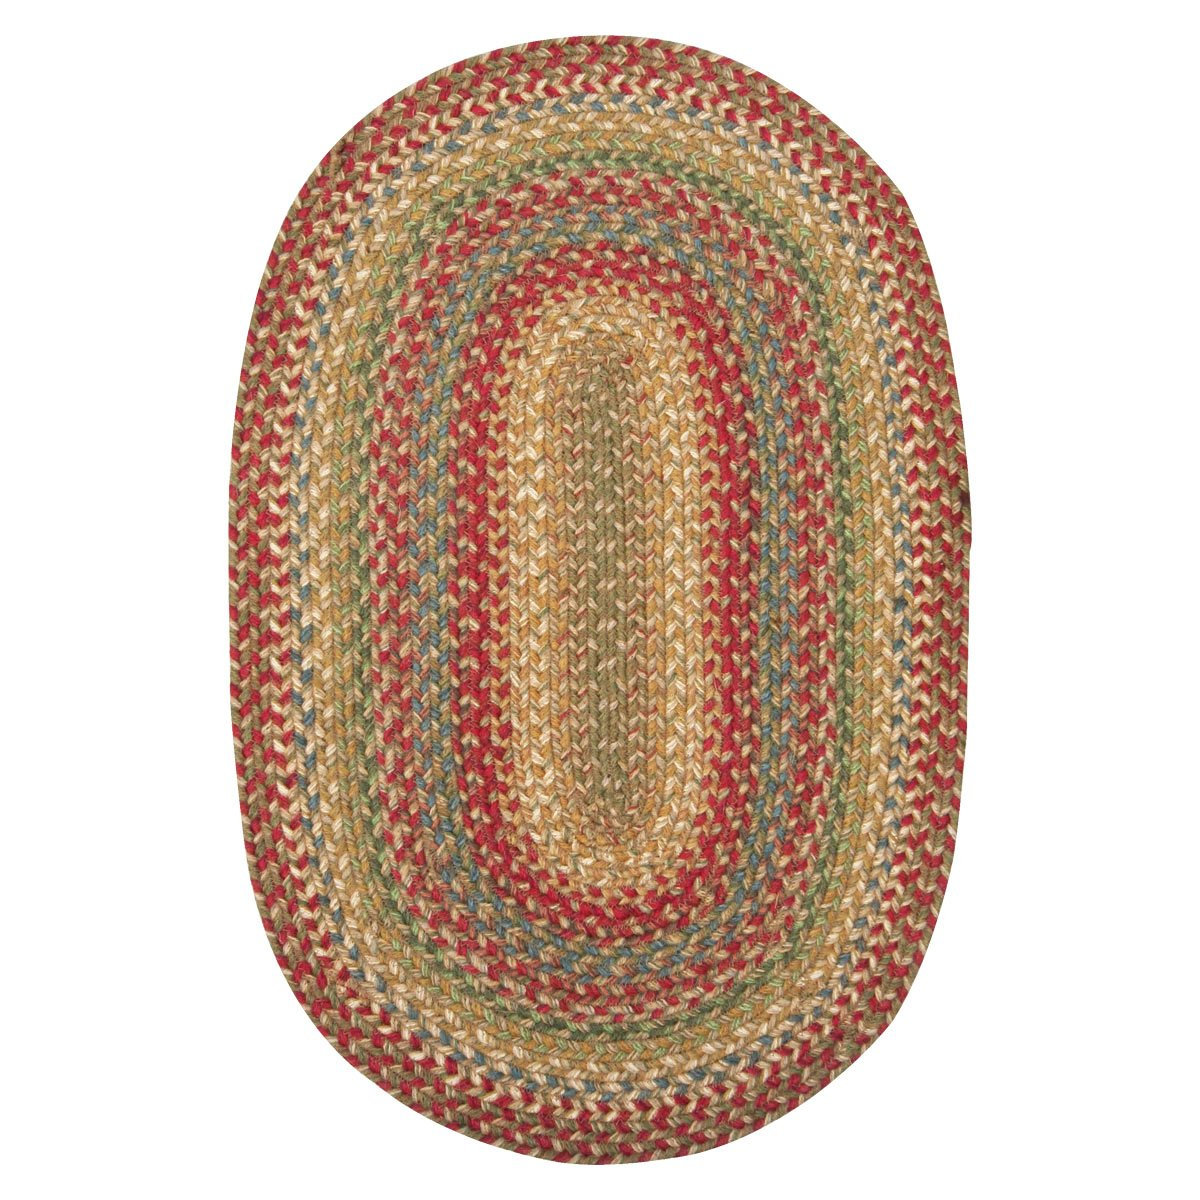 Homespice Oval Jute Braided Rugs, 4-Feet by 6-Feet, Azalea